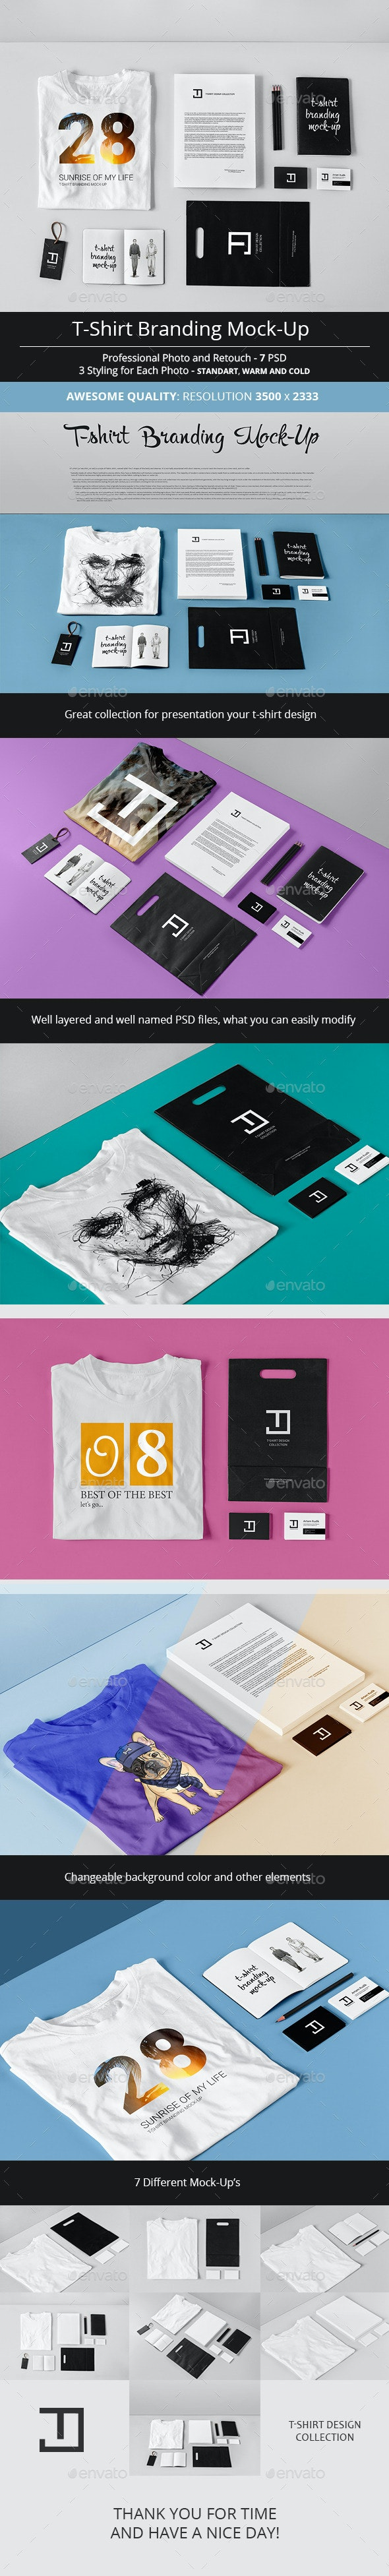 T-Shirt Branding Mock-Up - T-shirts Apparel